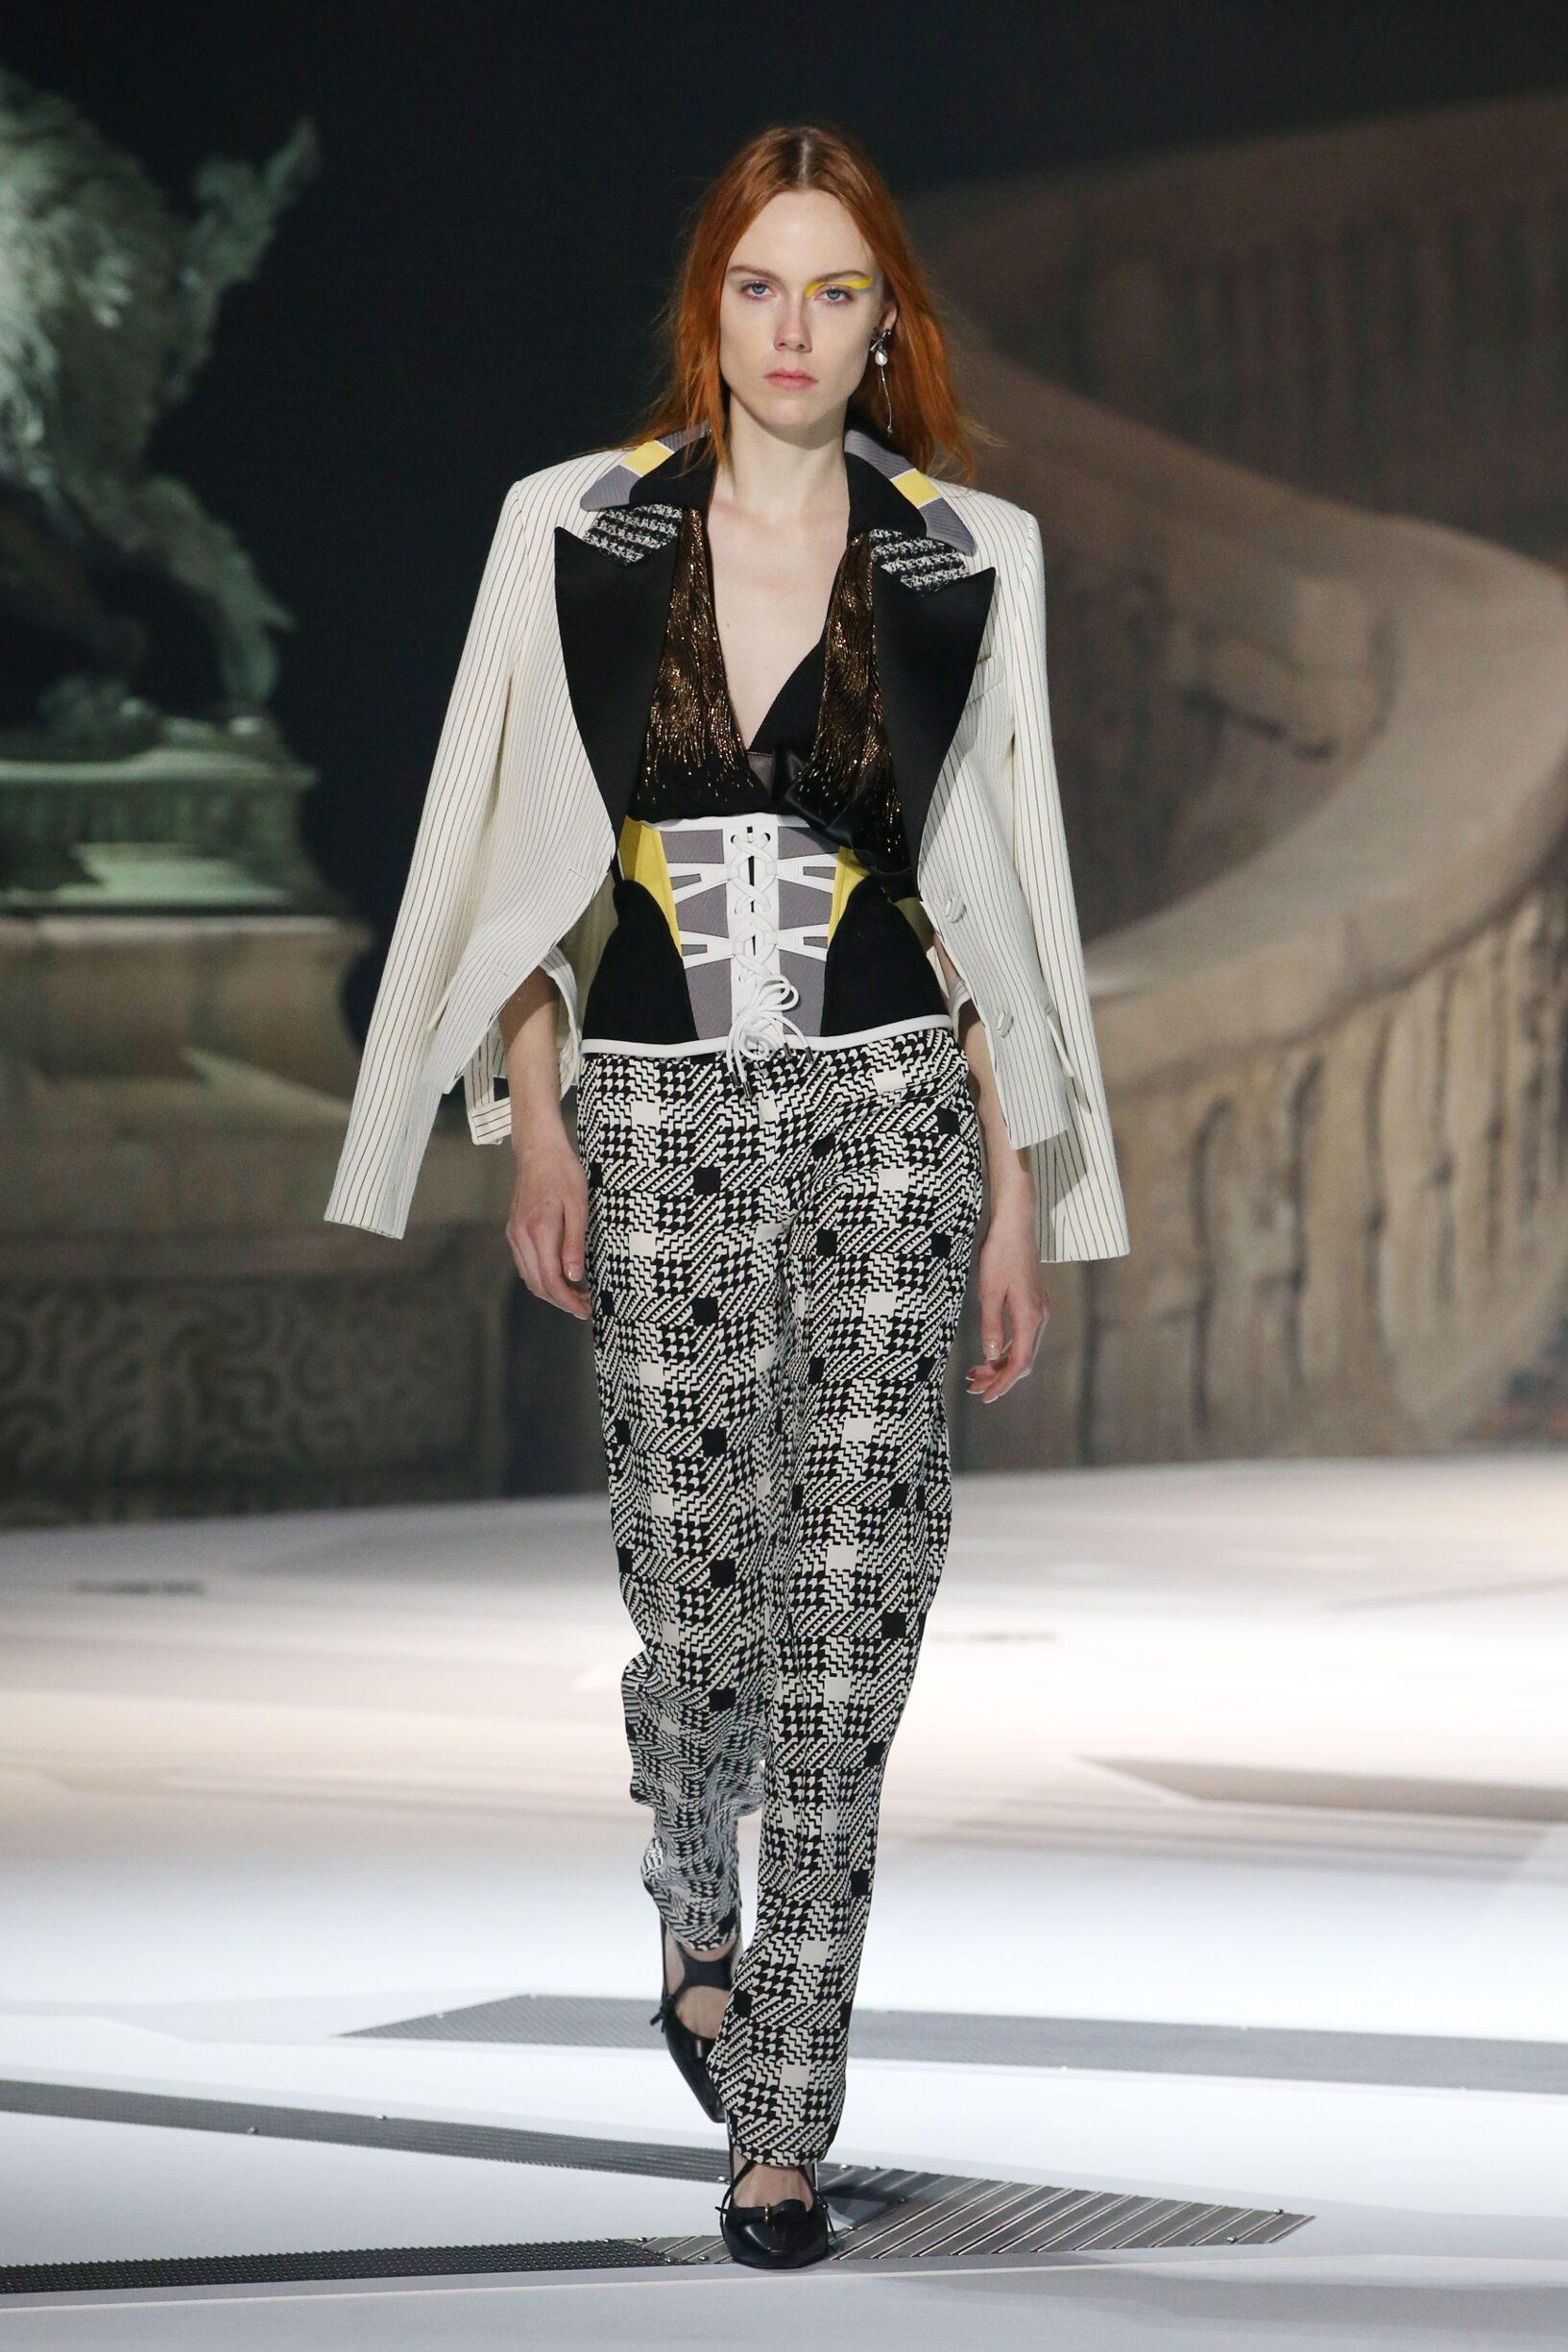 2018 Catwalk Louis Vuitton Woman Fashion Show Winter